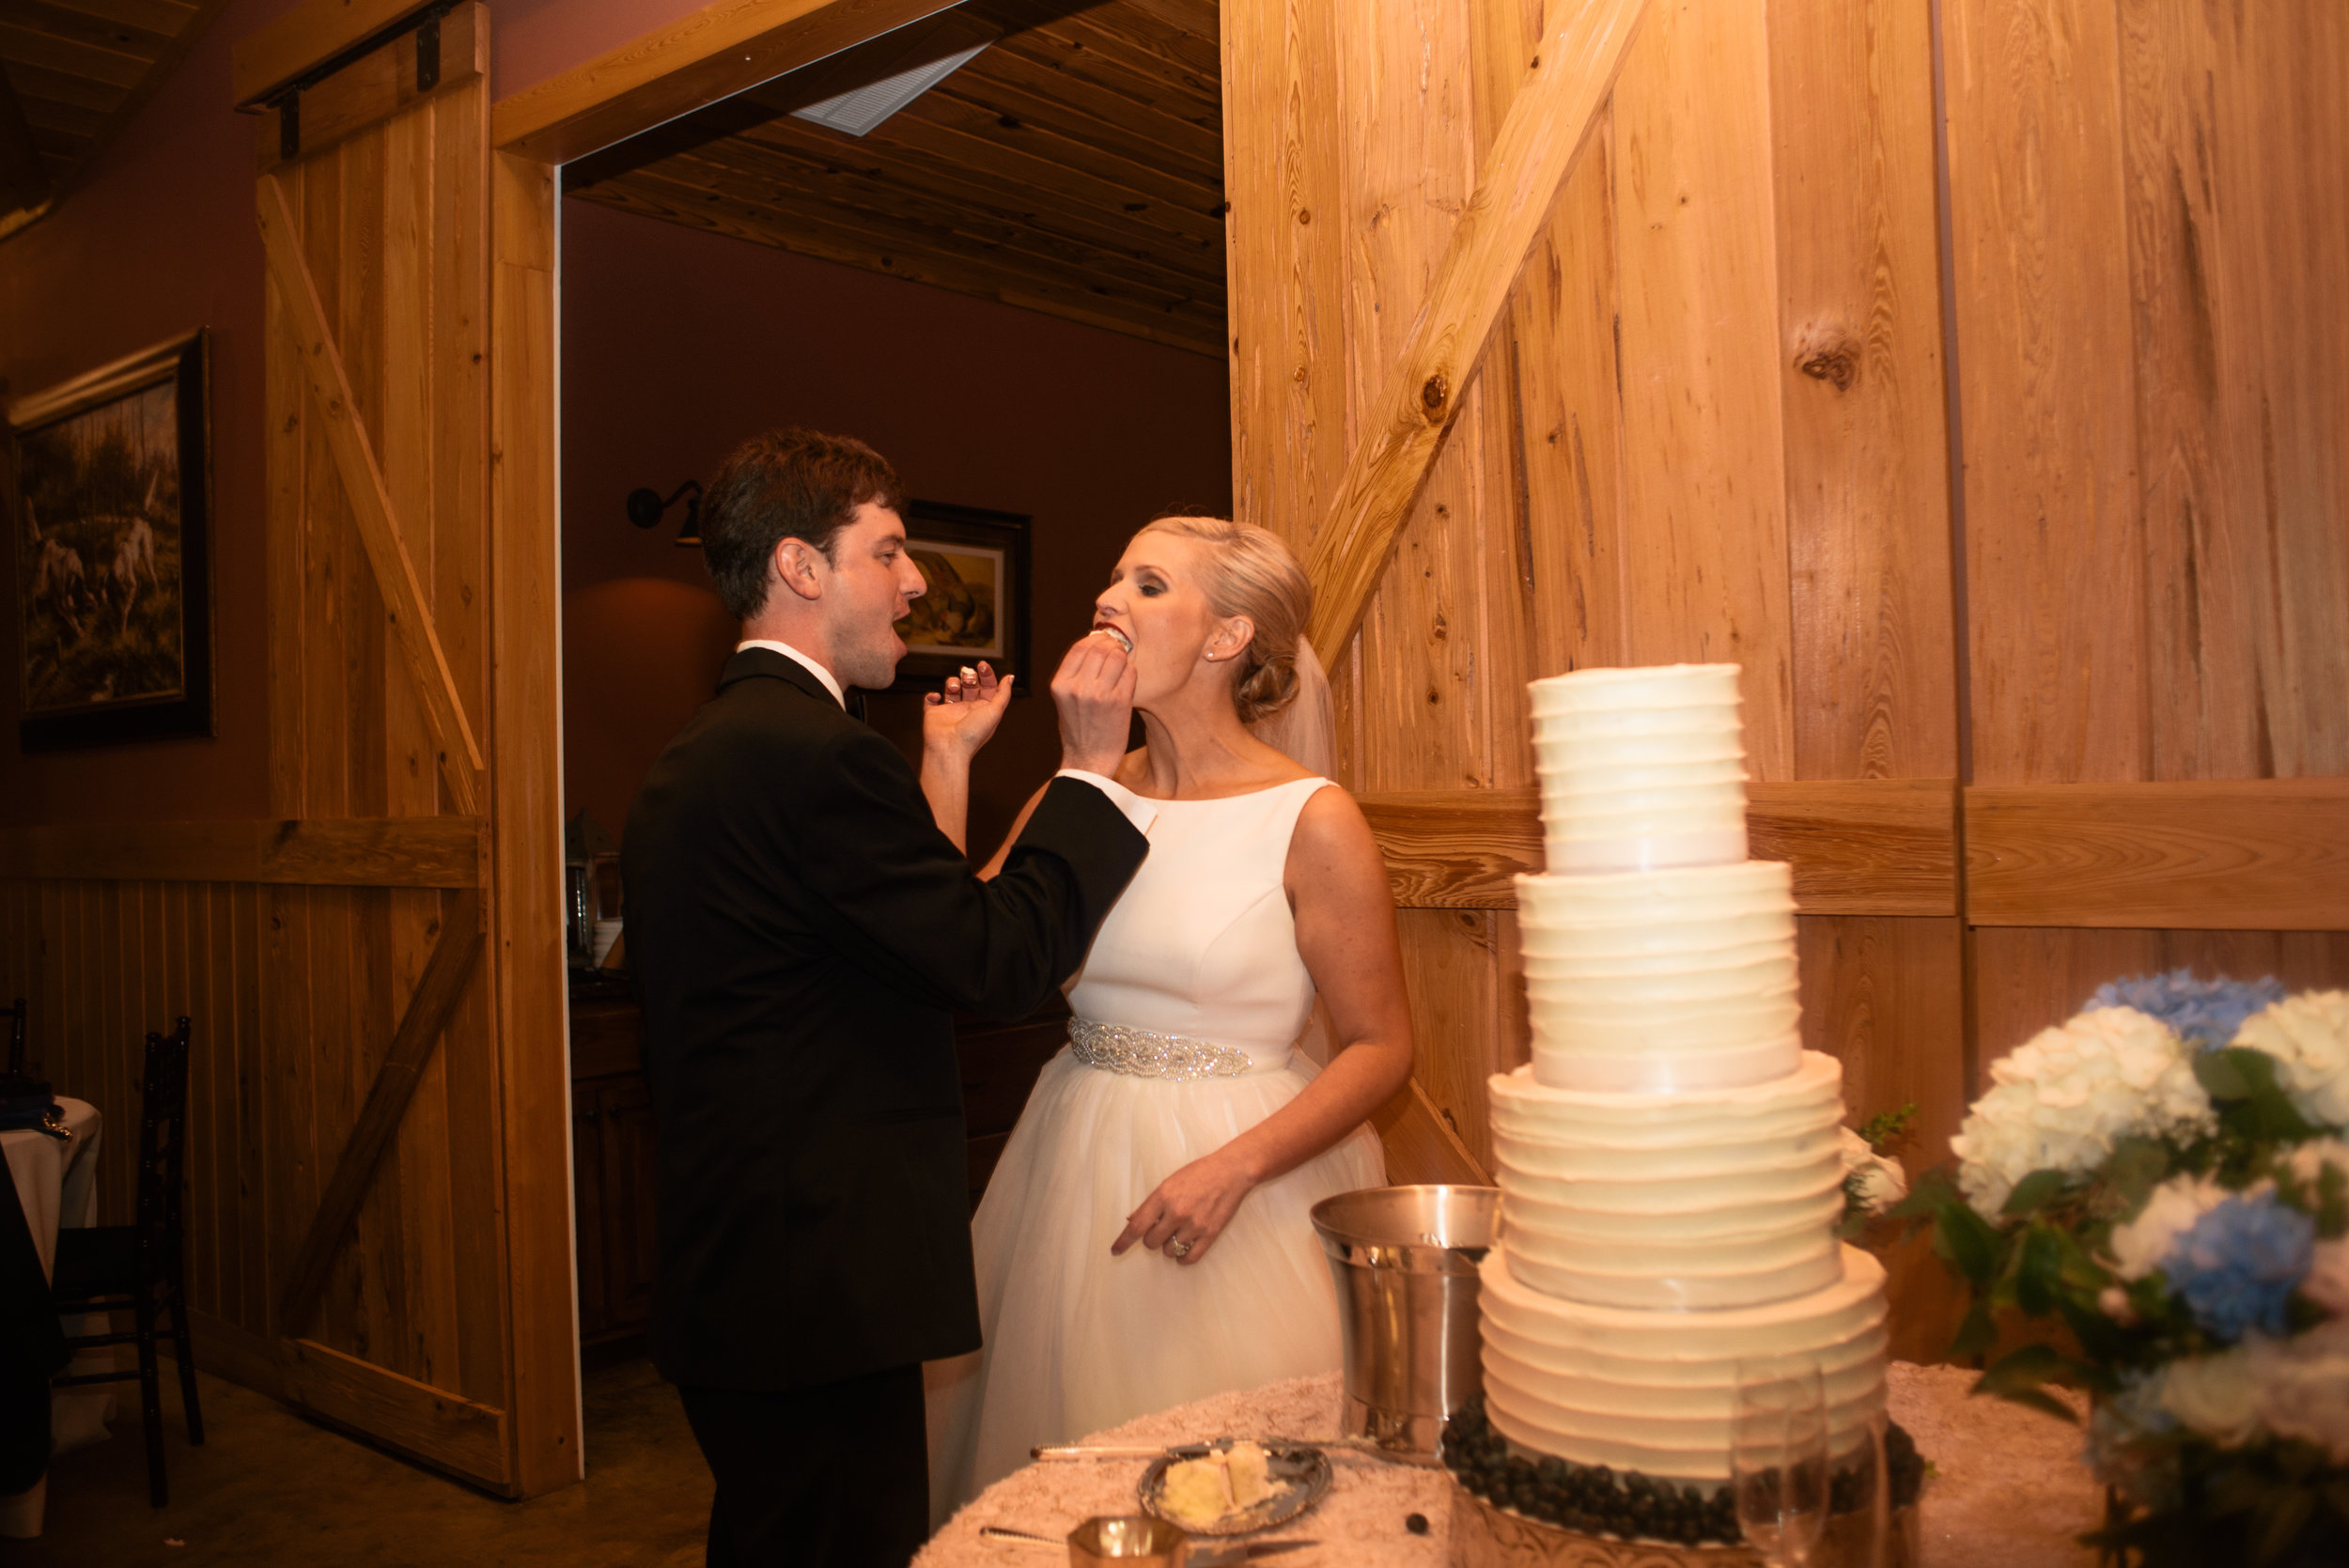 ali-and-jared-savannah-georgia-may-2017-wedding-meg-hill-photo-(746of760).jpg